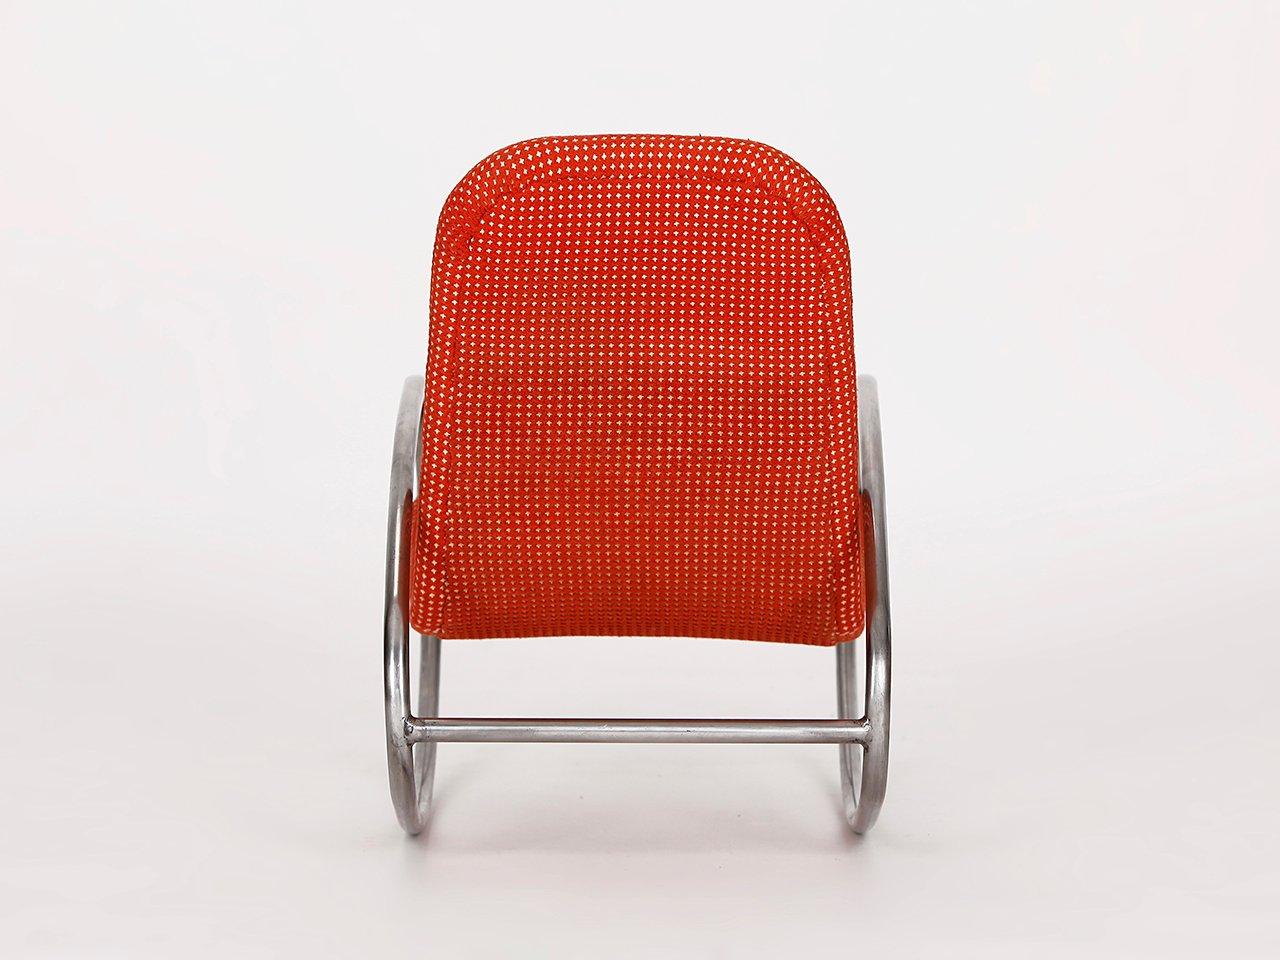 kinder schaukelstuhl 1930er bei pamono kaufen. Black Bedroom Furniture Sets. Home Design Ideas